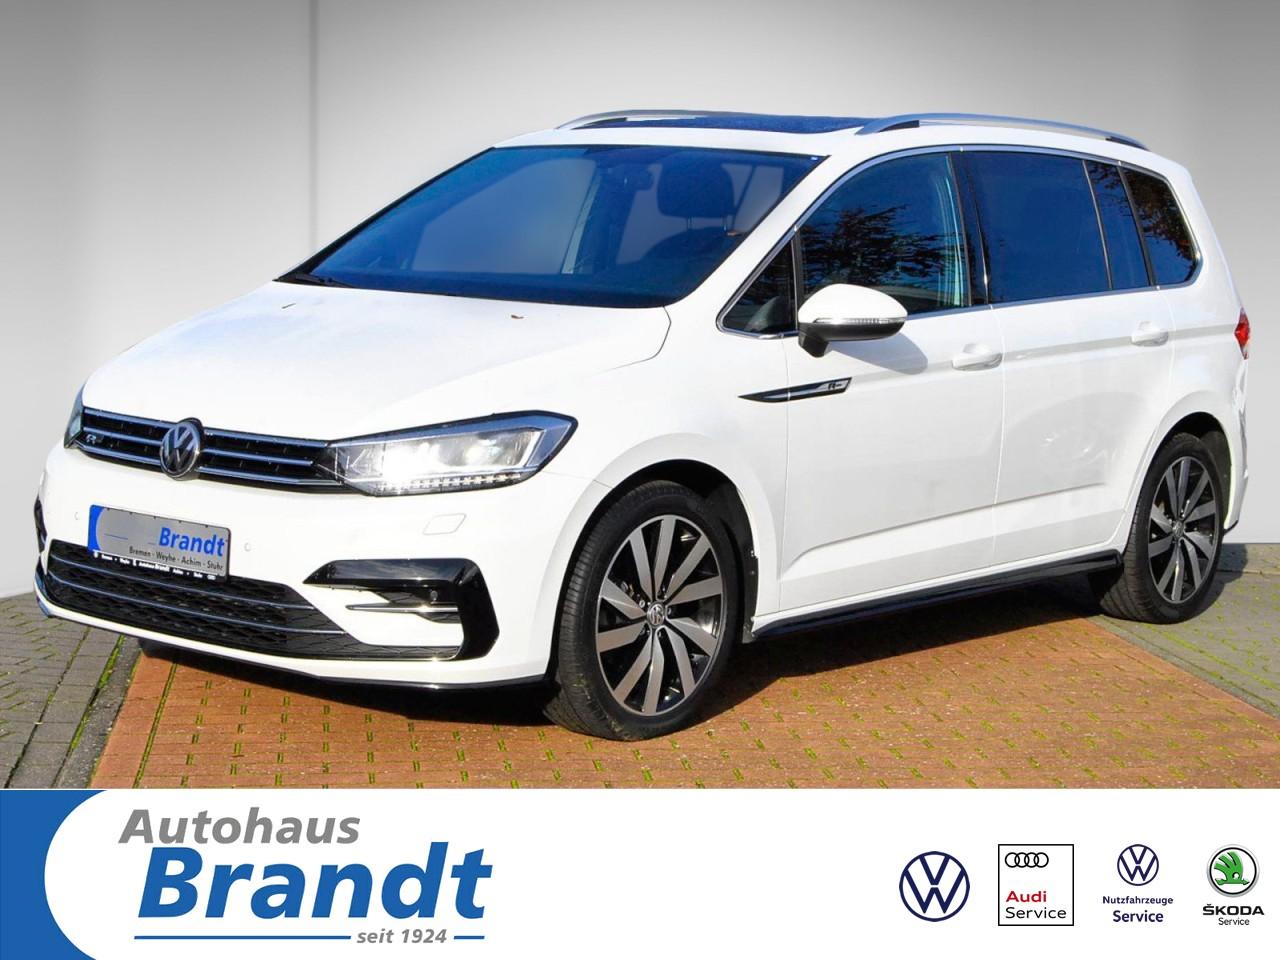 Volkswagen Touran 1.4 TSI Highline LED*R-LINE*NAVI*PANO*AHK, Jahr 2016, Benzin